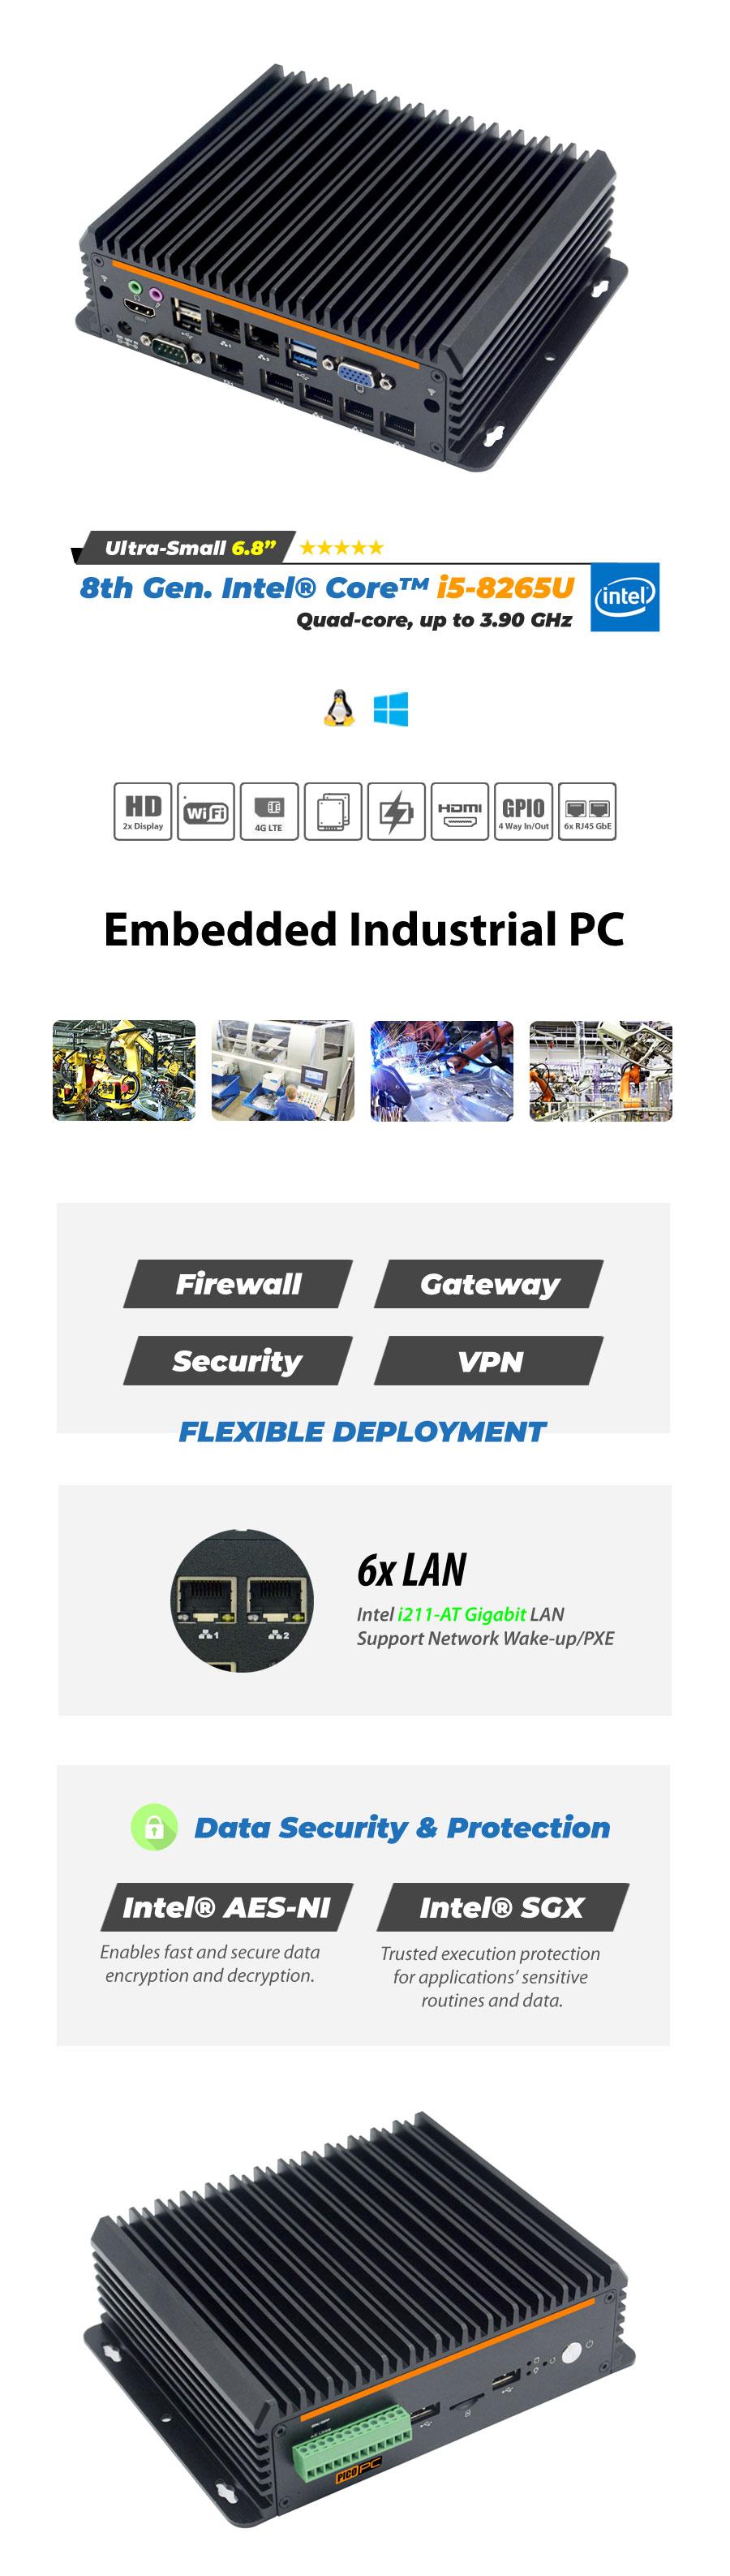 Intel® i5-8265U 6 LAN 4G Fanless Security Gateway - MNHO-085